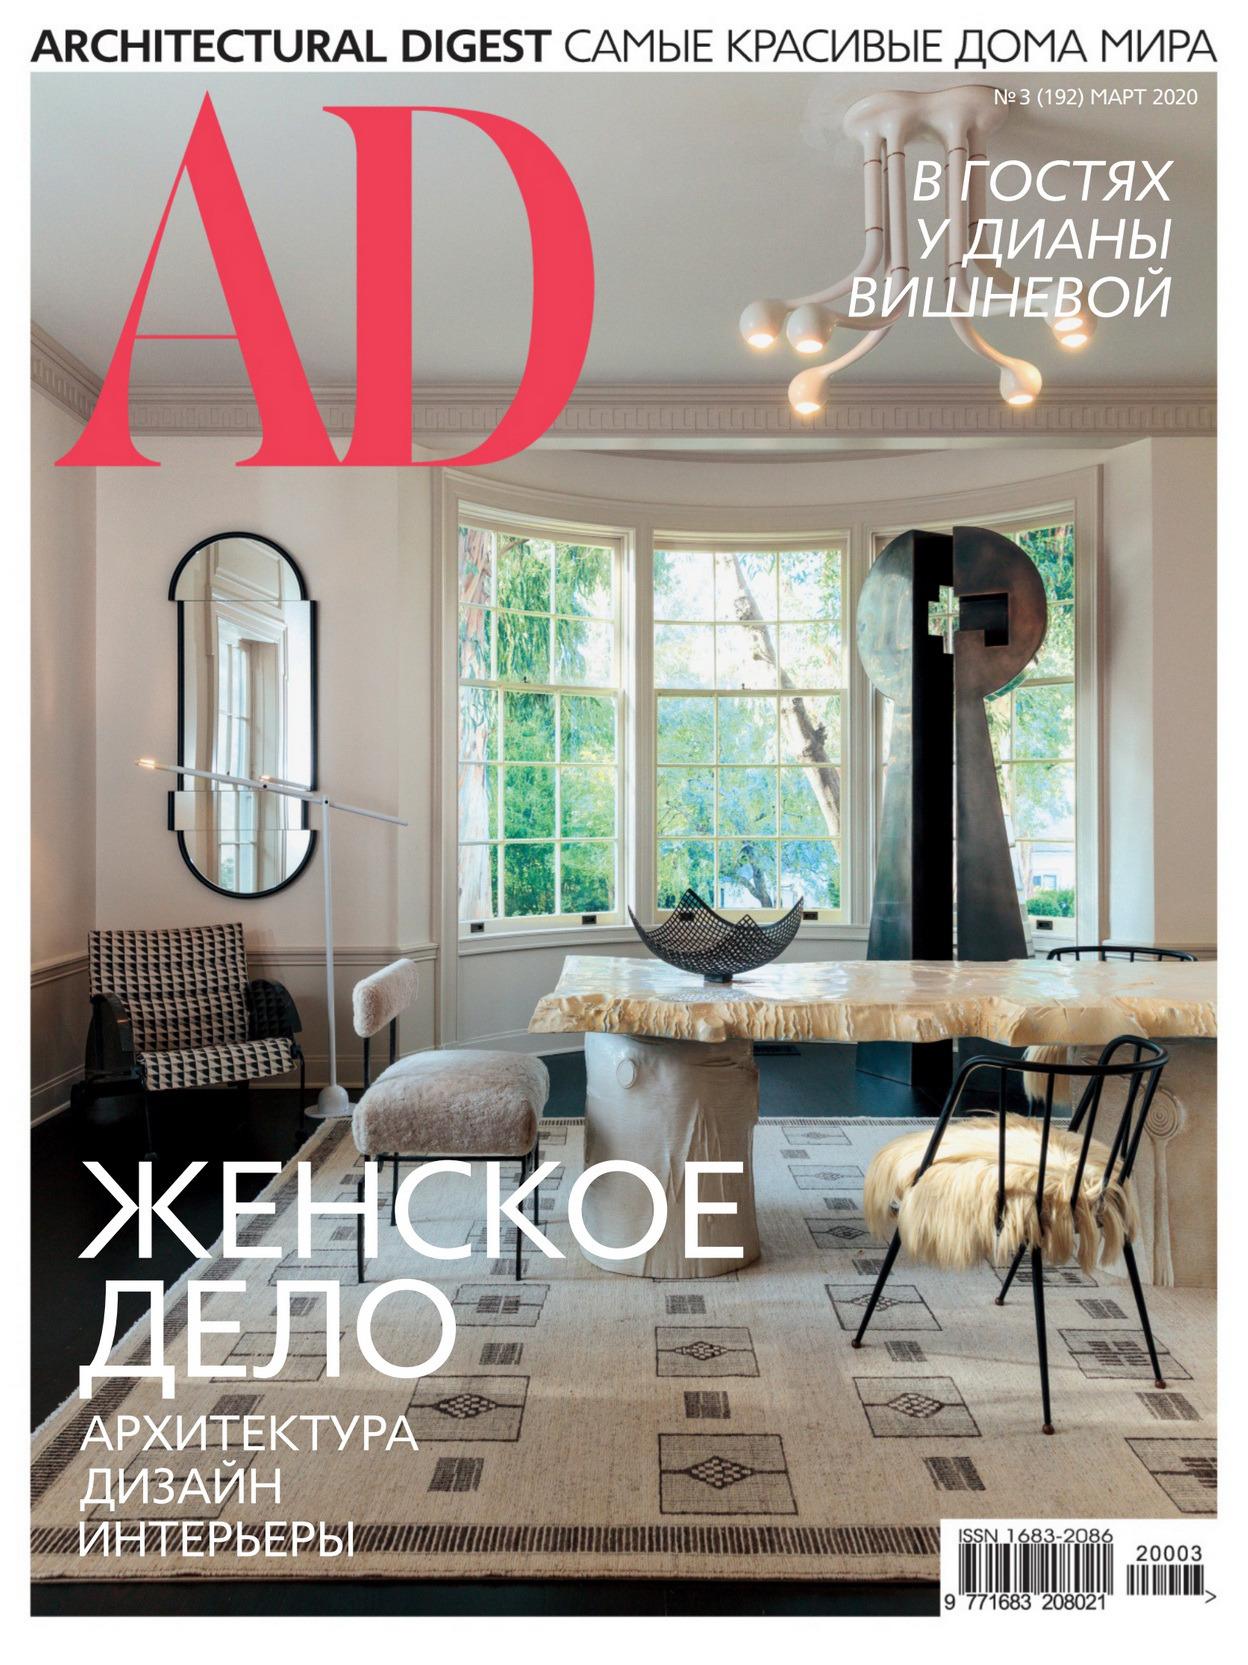 《AD》俄罗斯版室内室外设计杂志2020年03月号